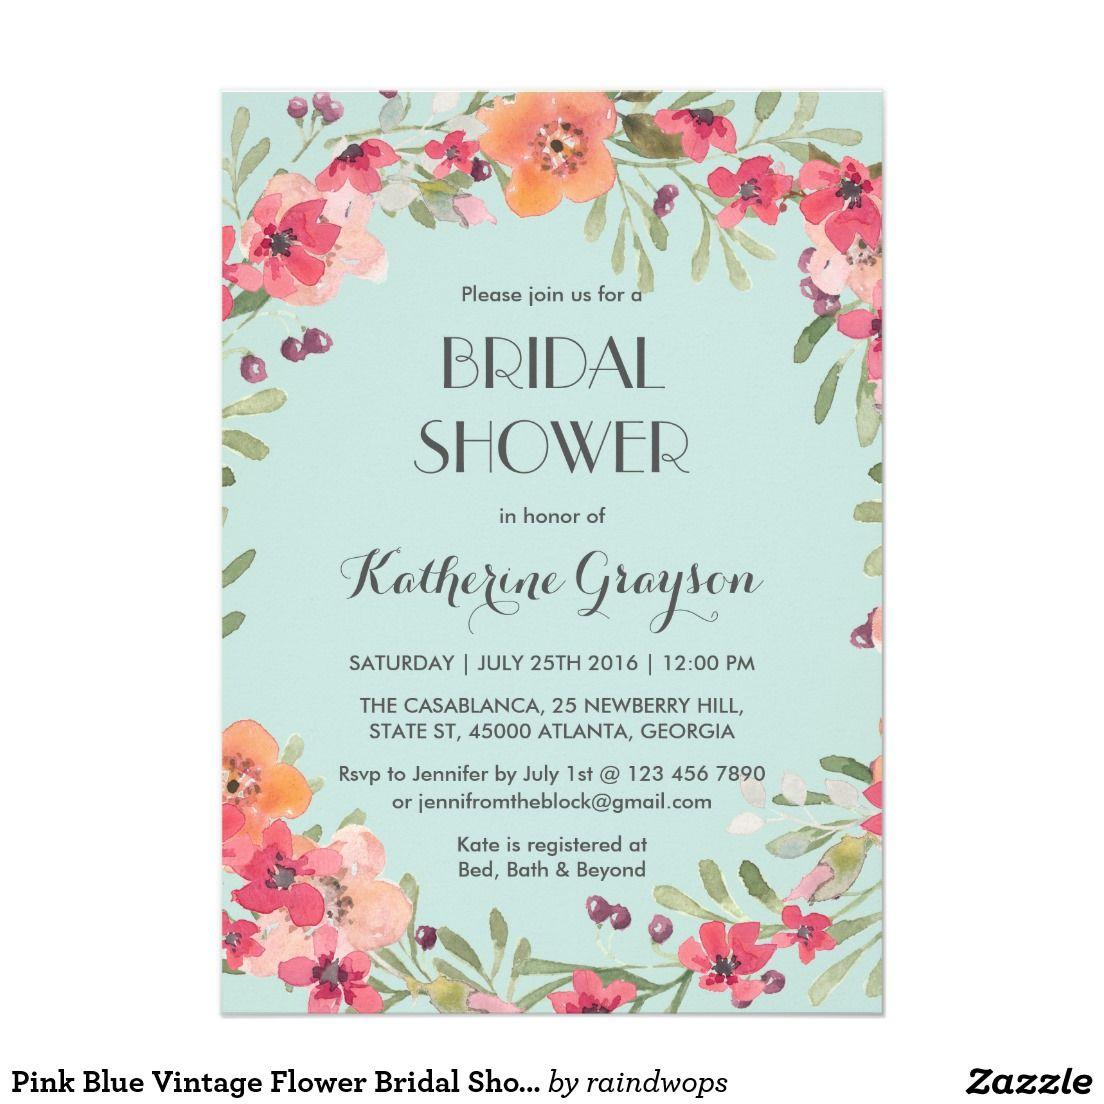 Pink blue vintage flower bridal shower invitation perfect weddings